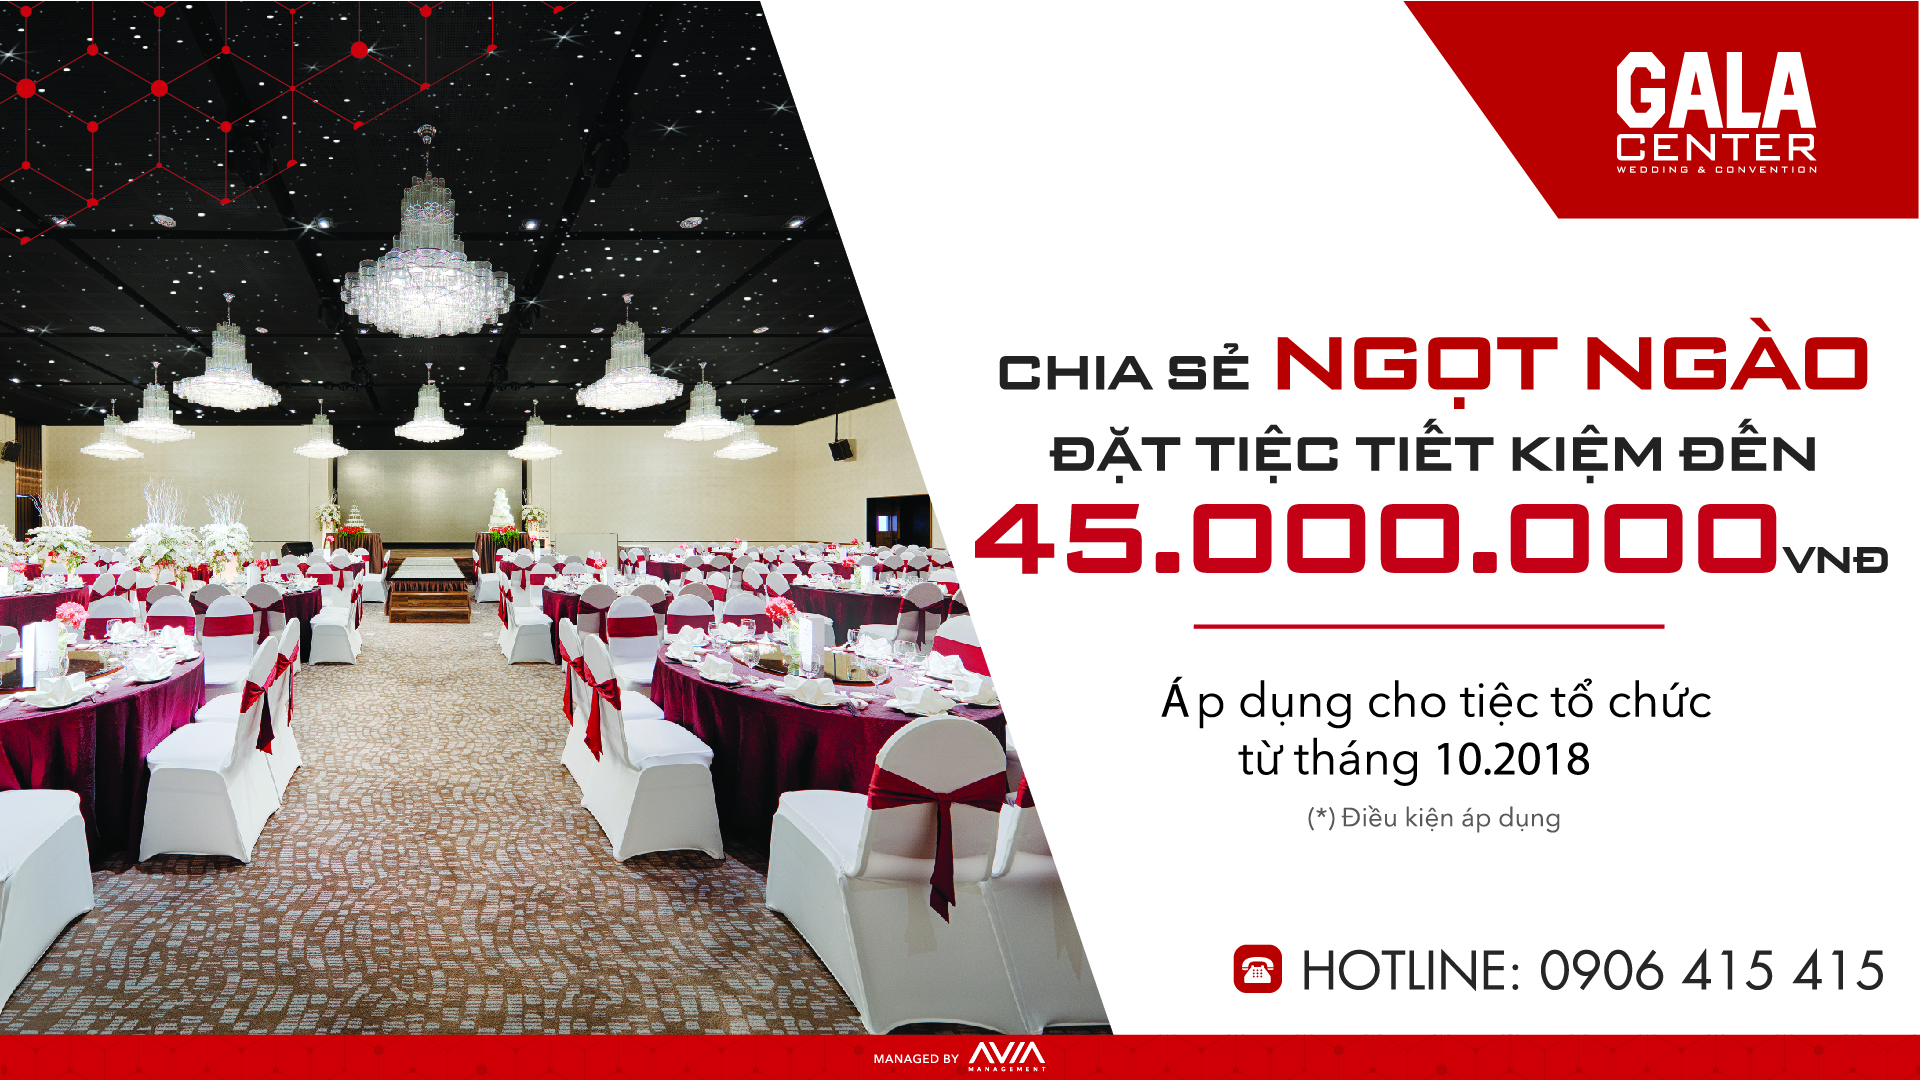 CHIA SE NGOT NGAO-01-01